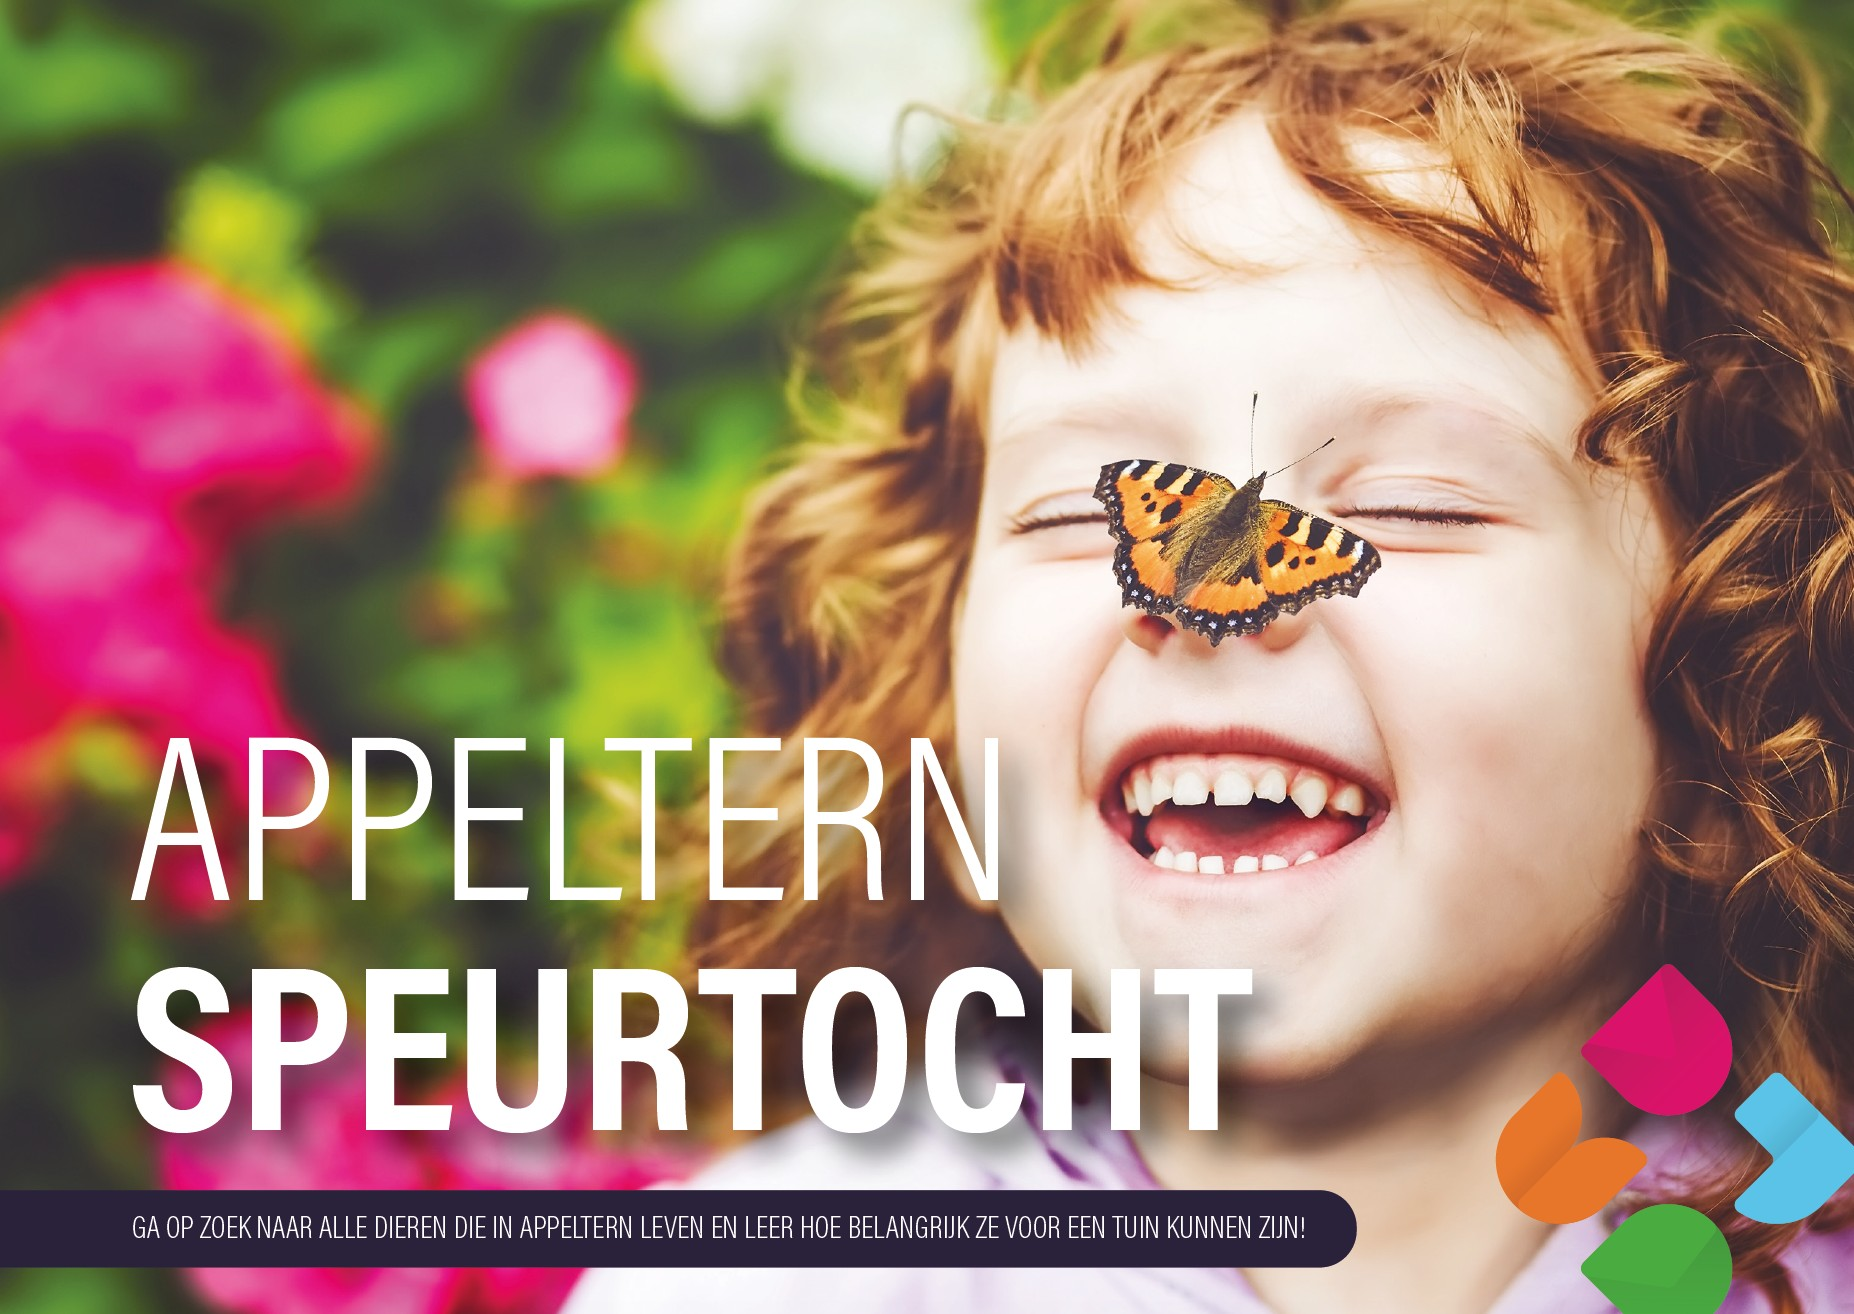 Appeltern-Speurtocht-2018_De-Tuinen-van-Appeltern